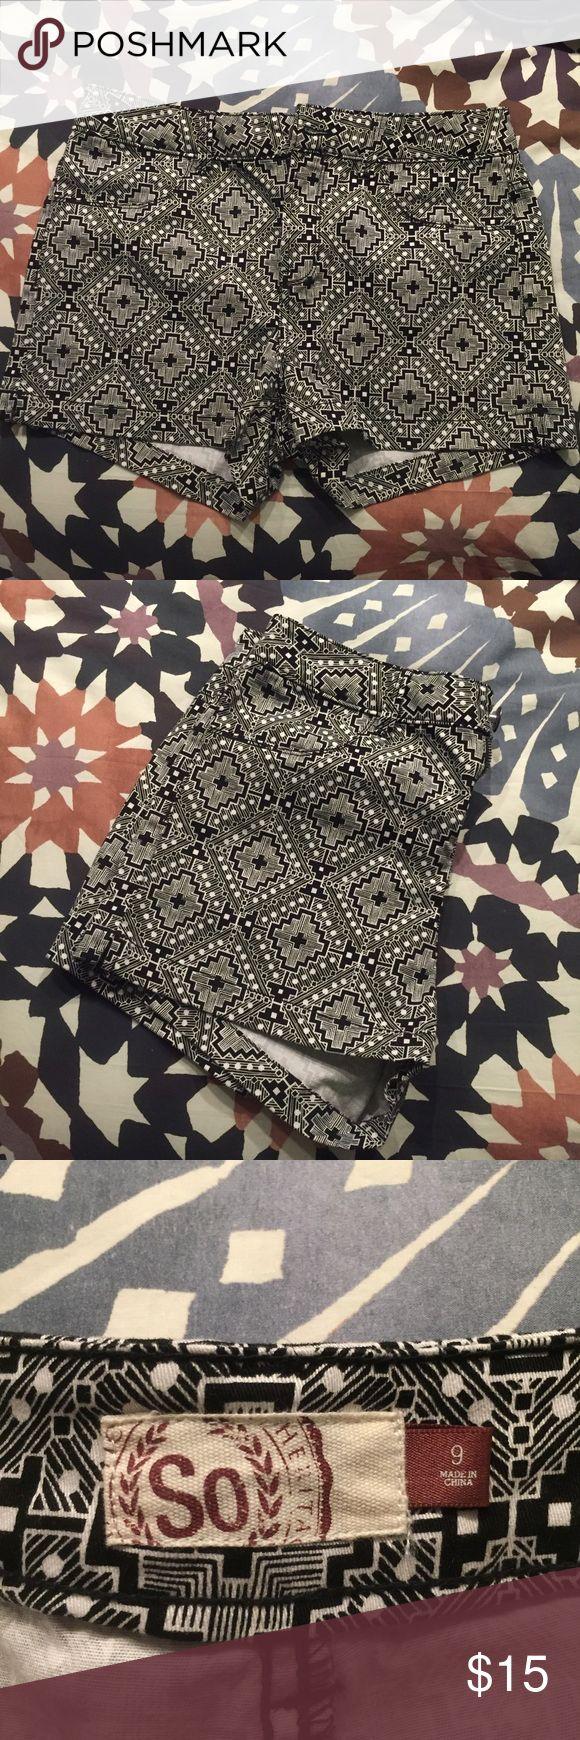 NWOT black and white Aztec shorts Brand new without tags. Black and white Aztec patterned shorts. Size 9 juniors. SO Shorts